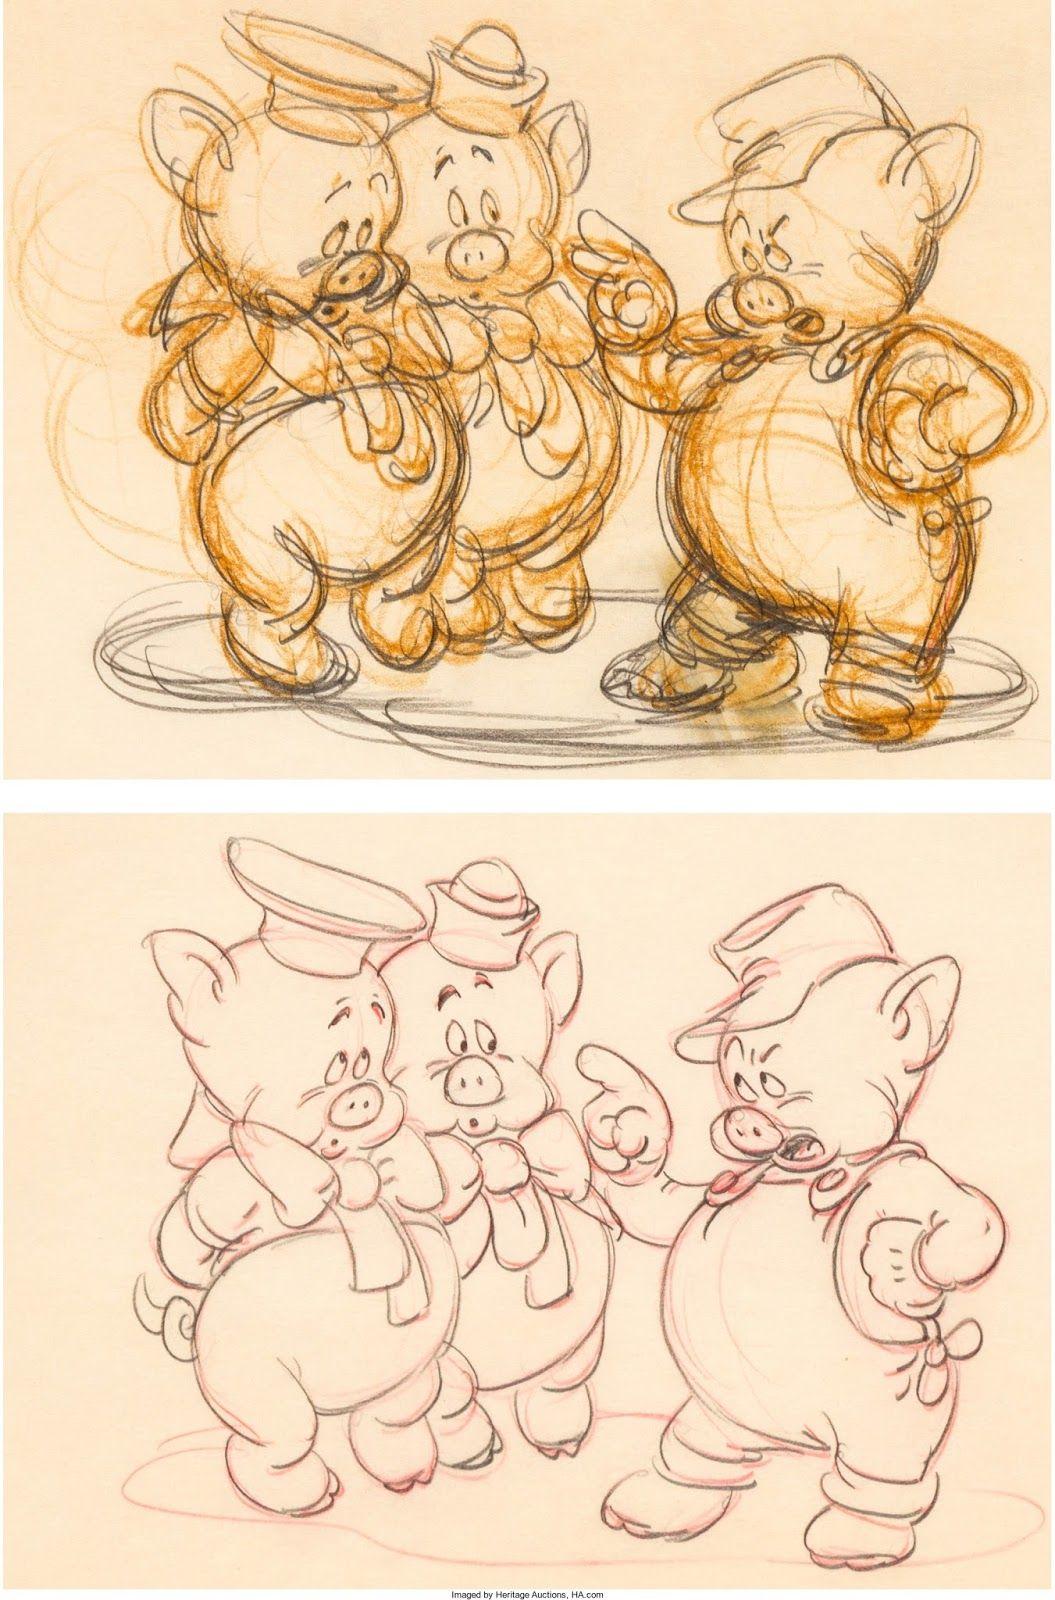 The Three Little Pigs Production Sketch And Clean Up Tatuaje De Cerdo Cerditos Dibujos